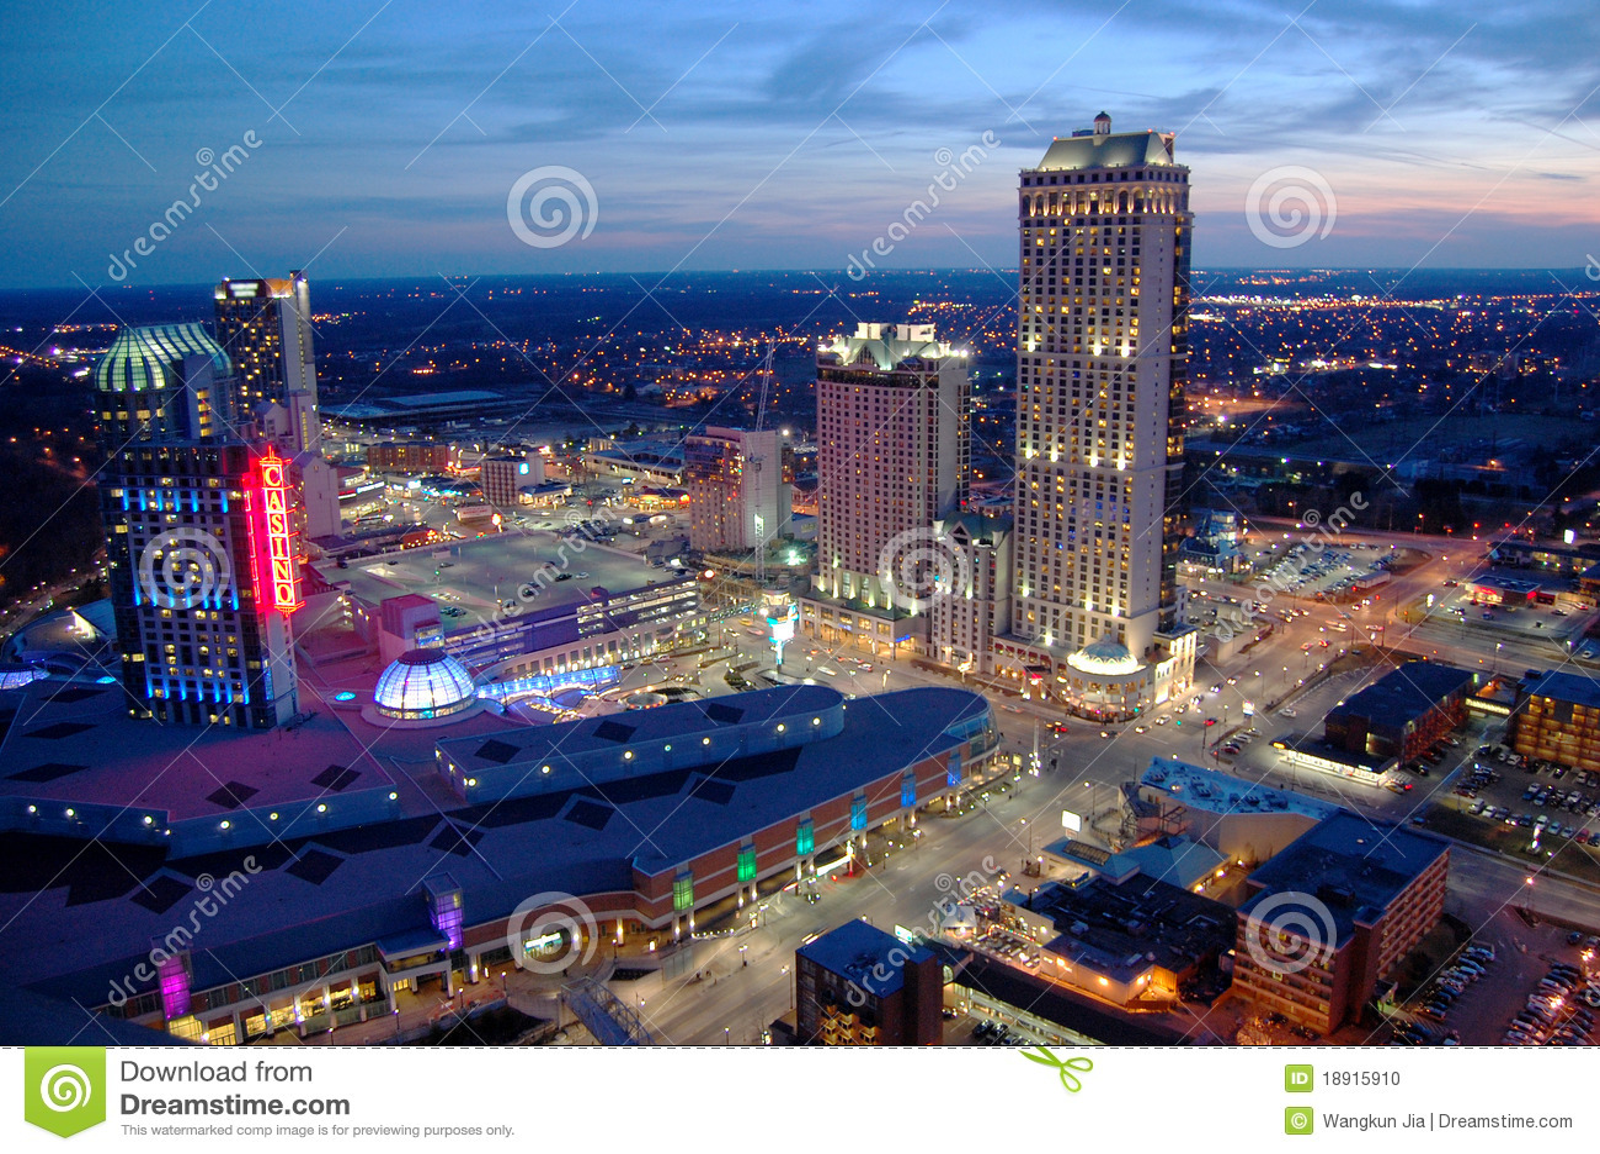 Niagara Falls Casino And Resorts Stock Photo - Image: 18915910